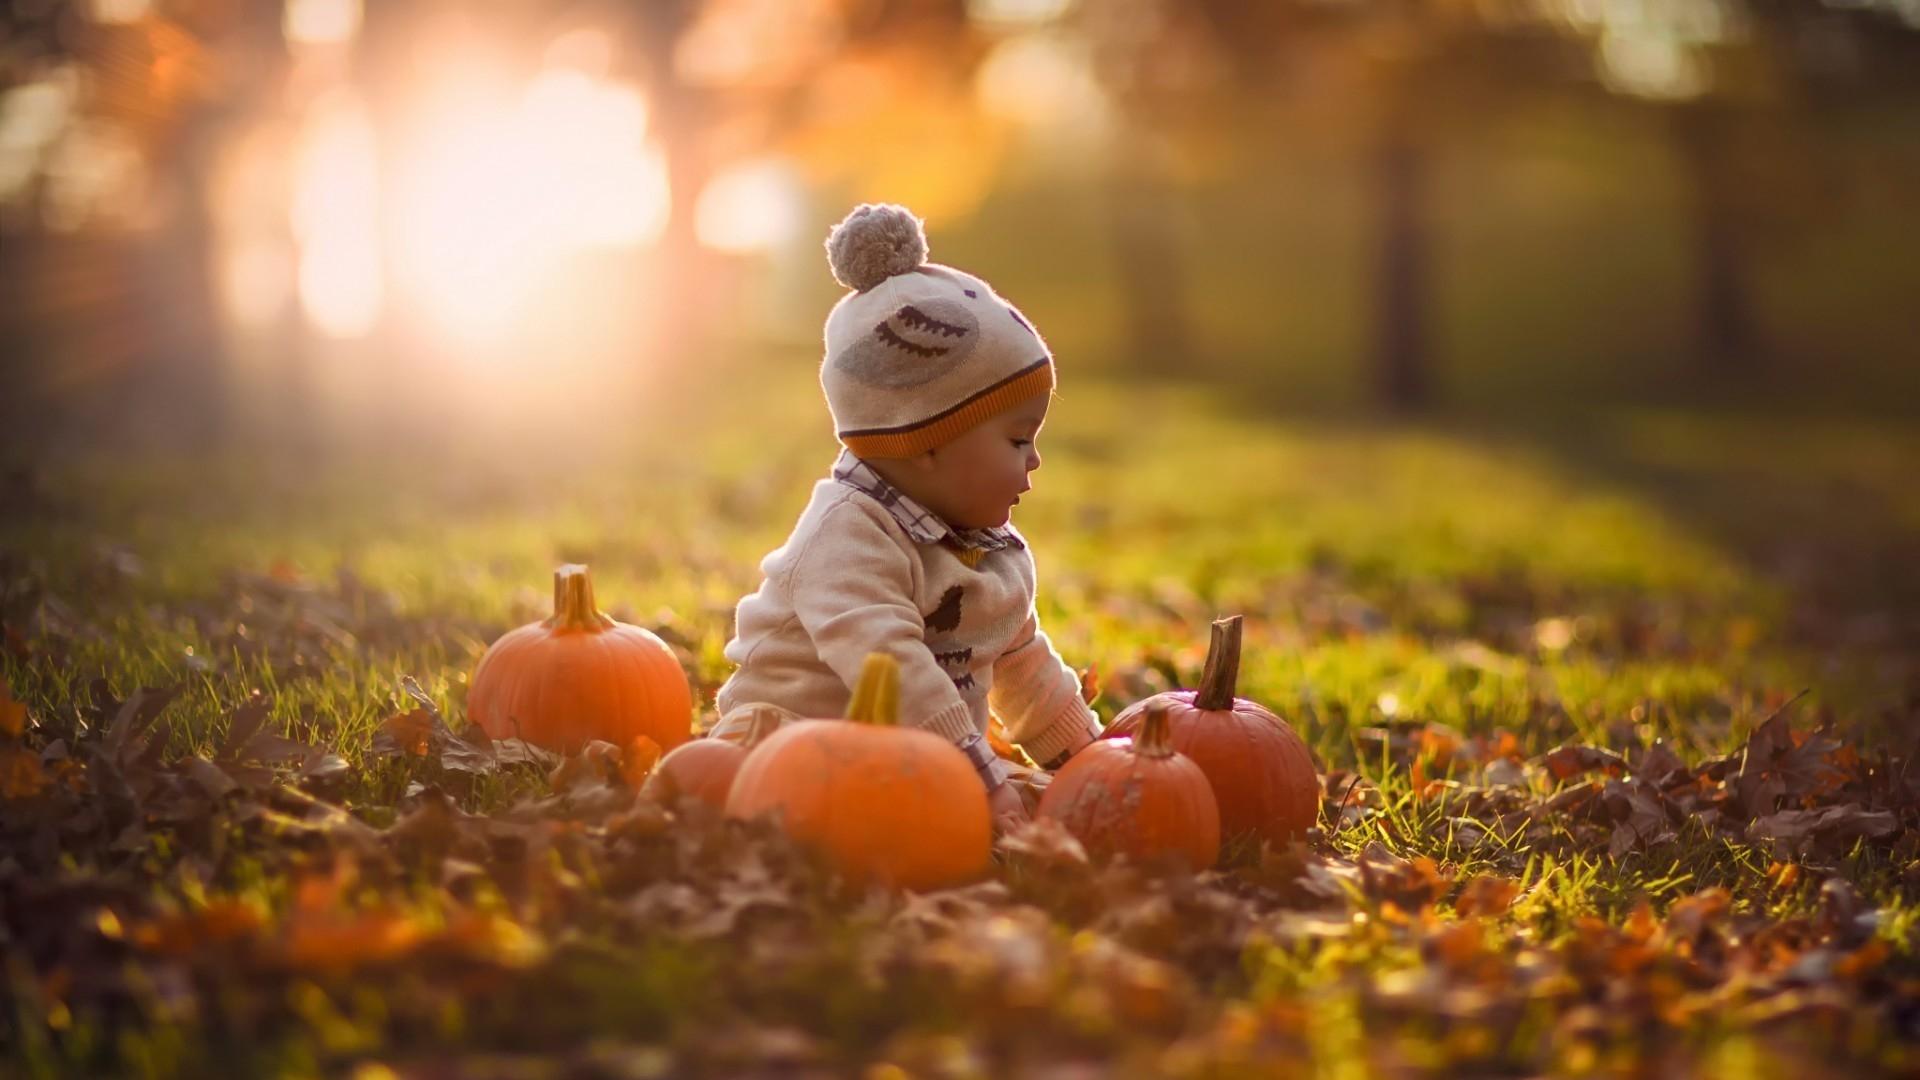 Moda bebe otoño invierno 2020